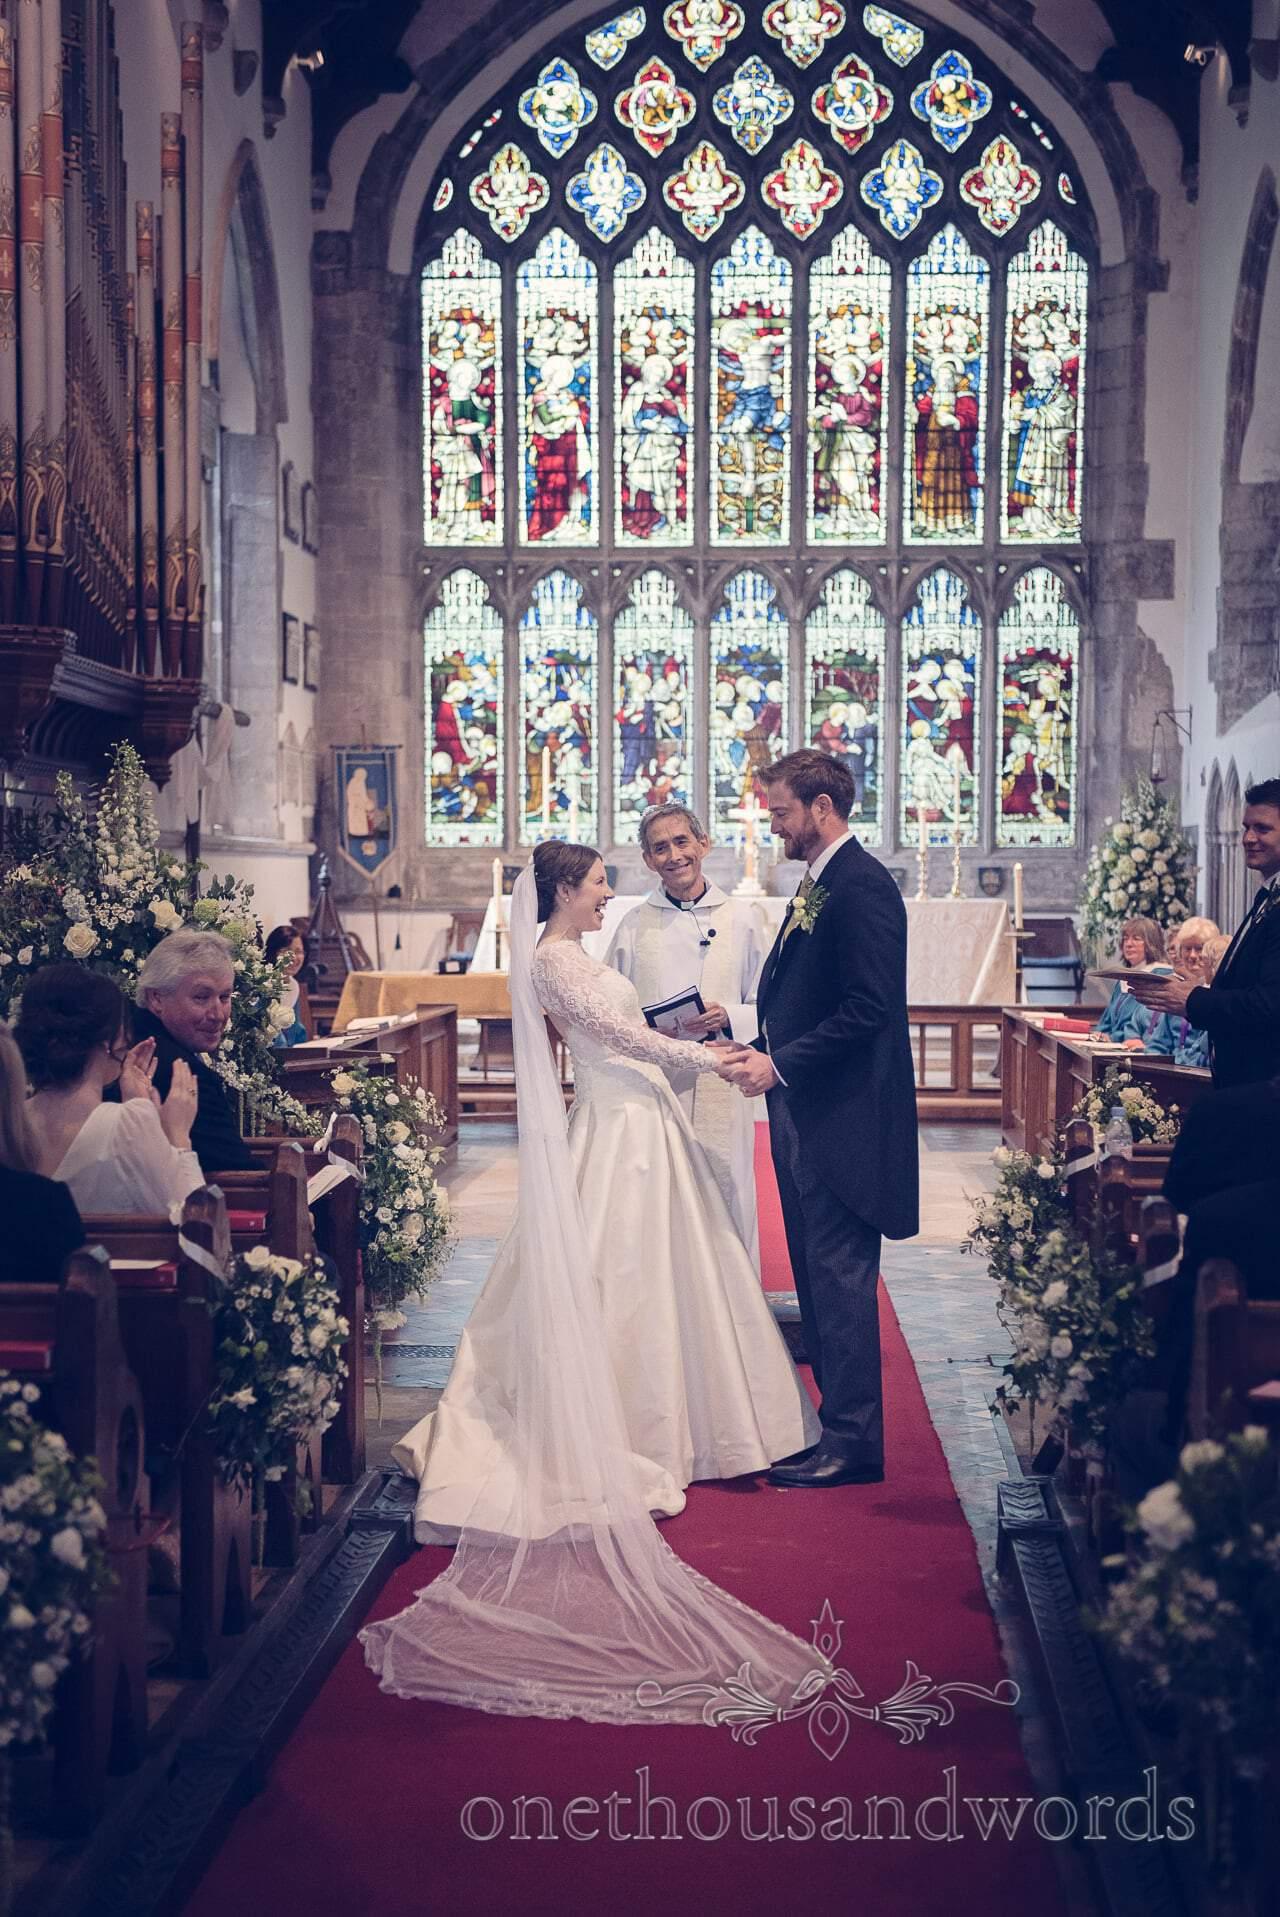 Bride and groom wedding service in St Marys Church, Wareham